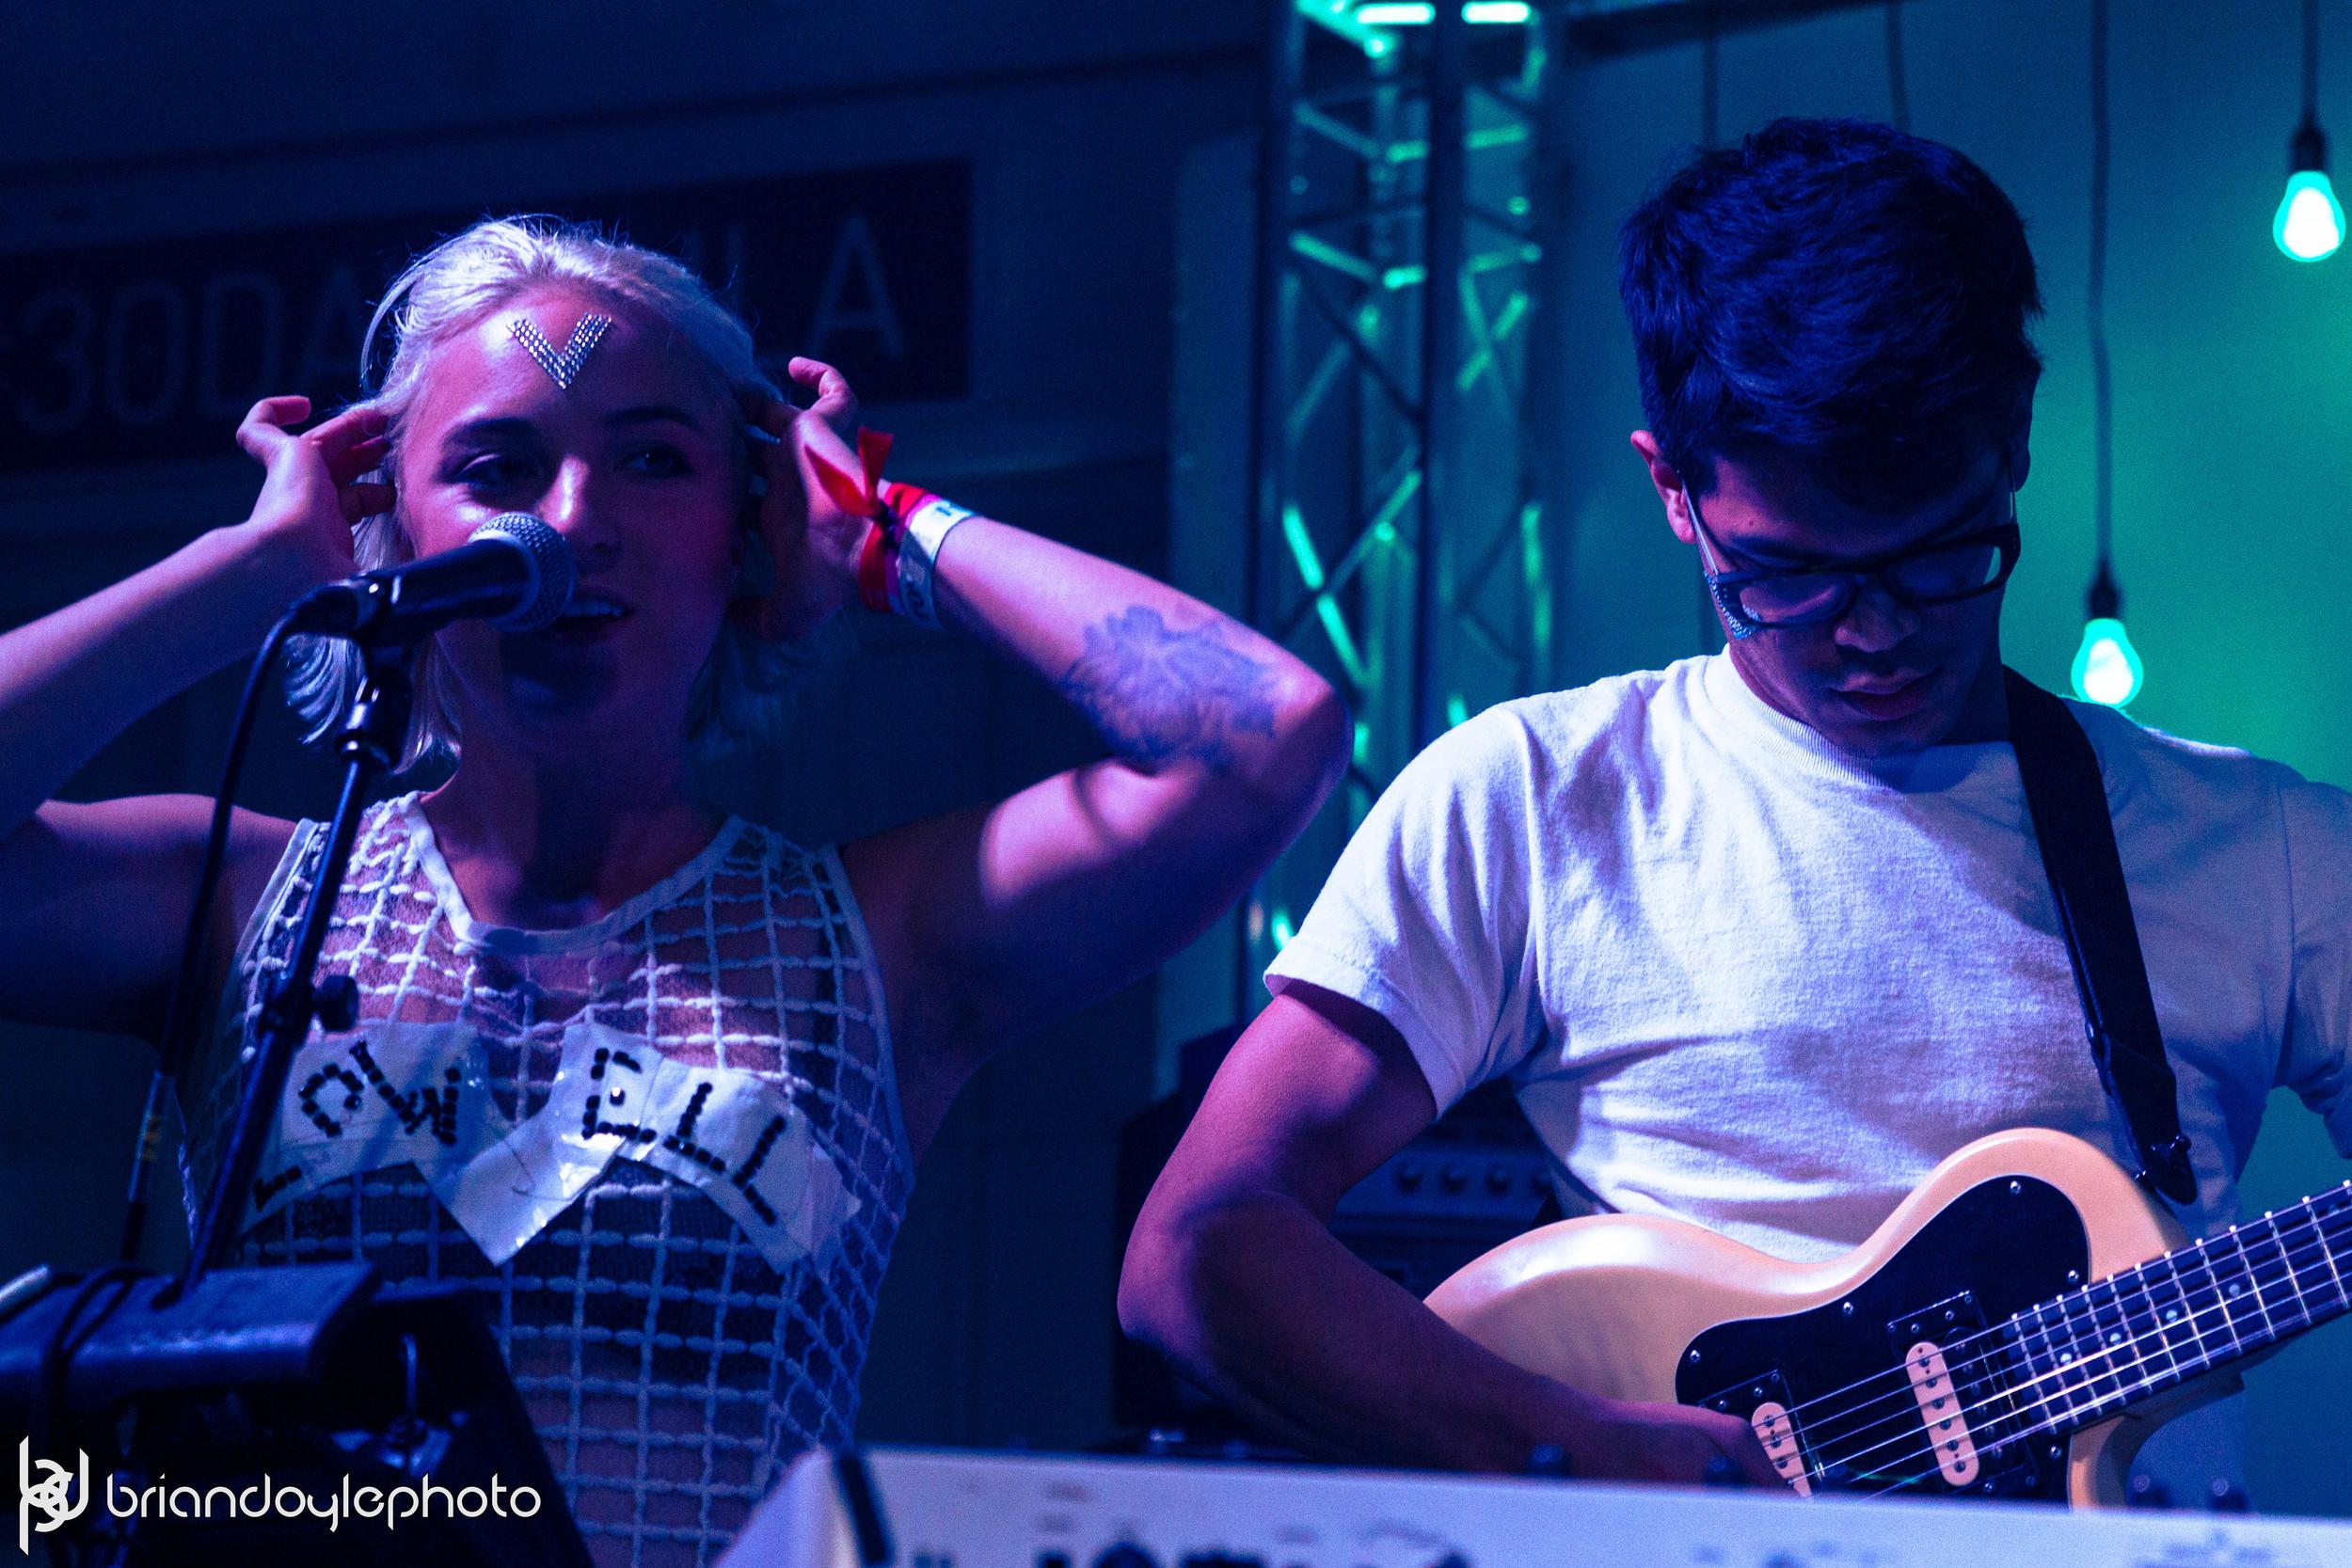 Red Bull - Dum Dum Girls, Tropicana and the Flea, Lowell @ The Well 2014.11.16-5.jpg